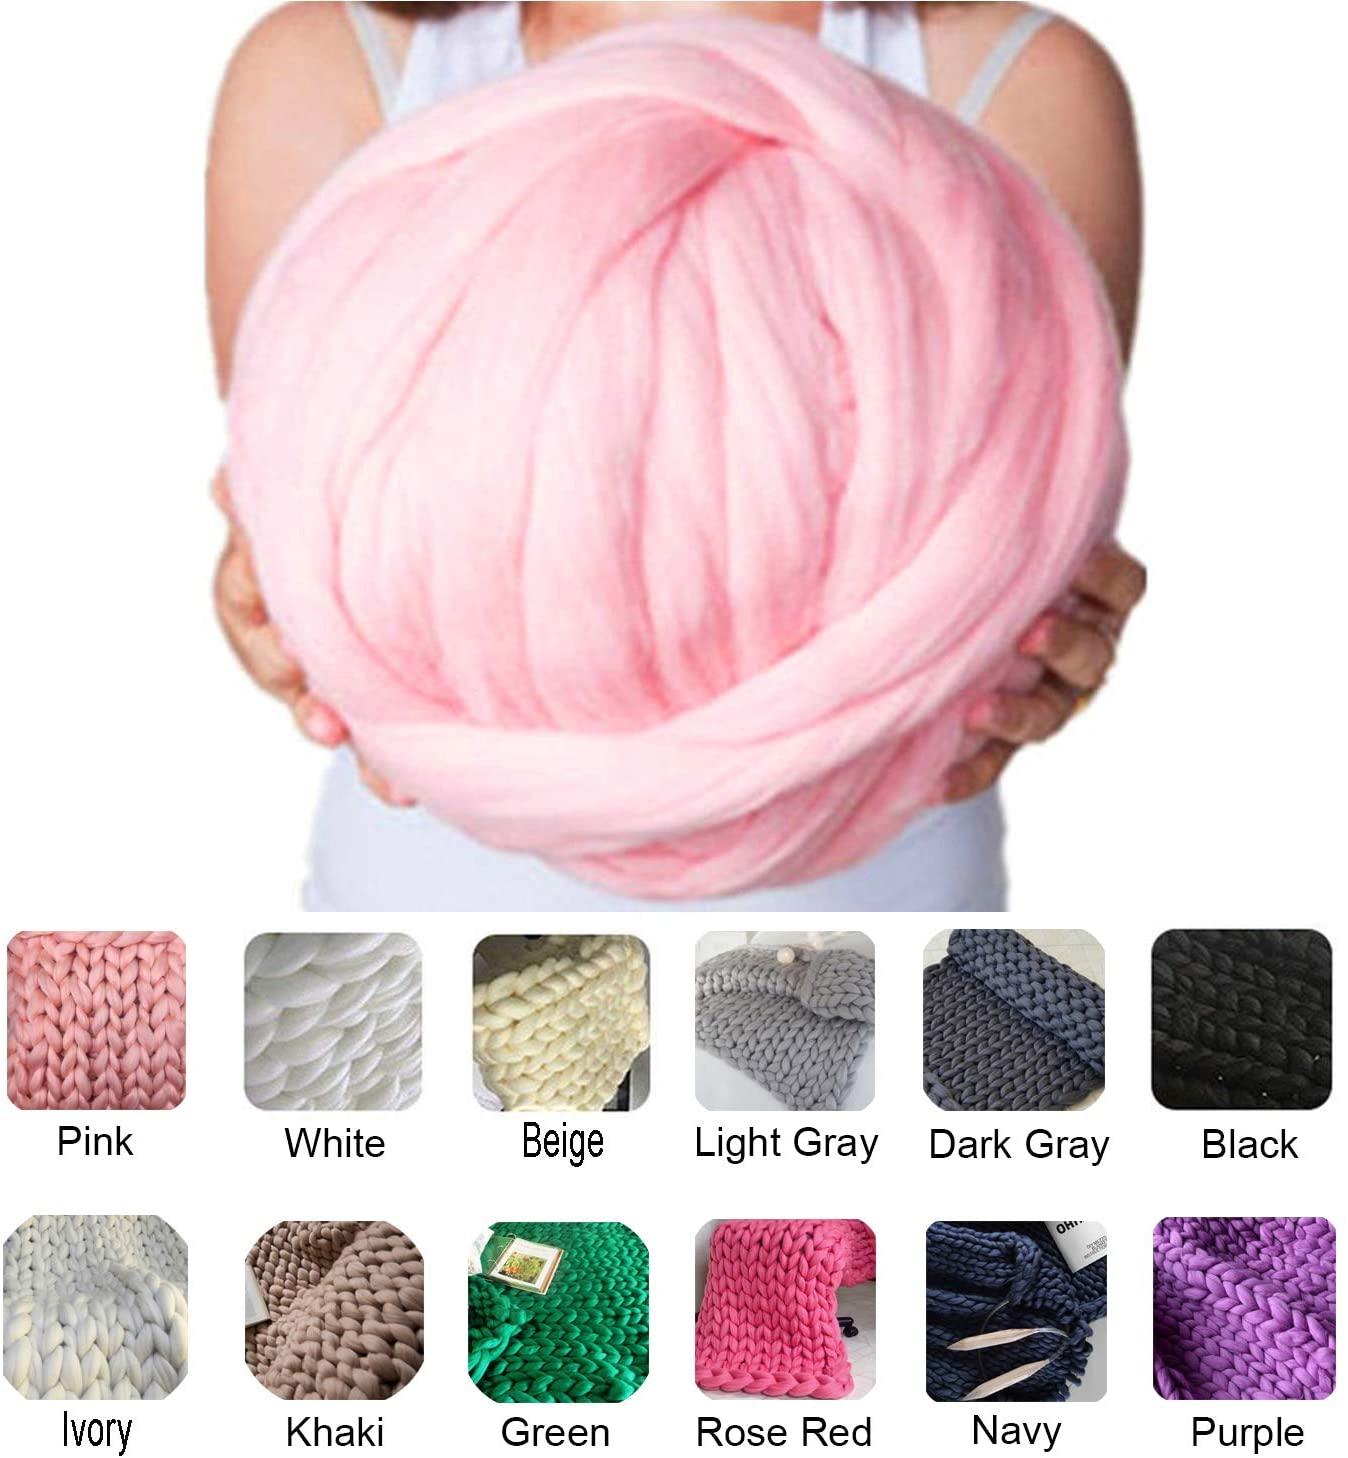 clootess Chunky Merino Wool Yarn Bulky Big Roving for DIY Hand Made Knit Blanket Throw - Pink 8 lbs